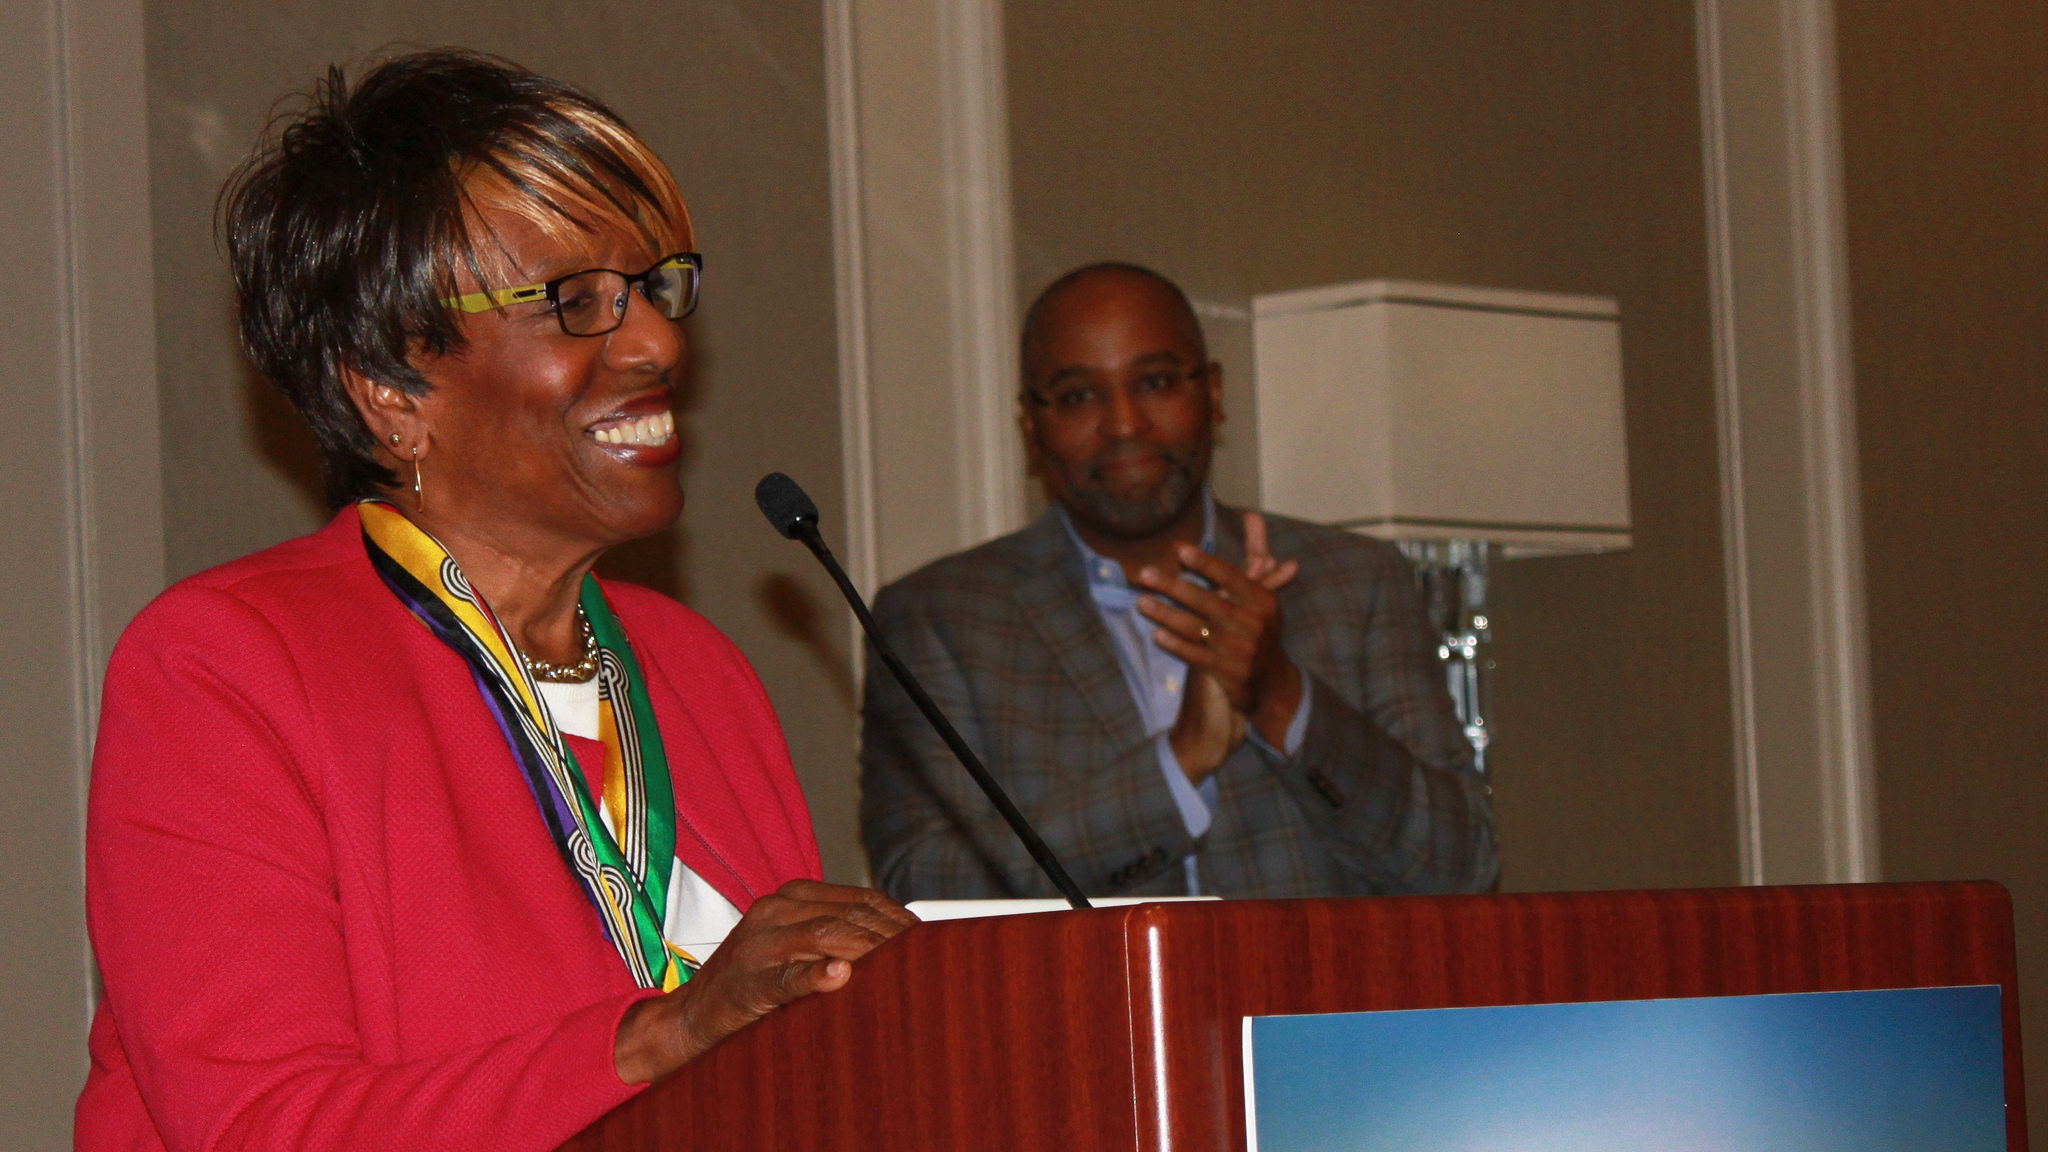 Dr. Sandra Richards